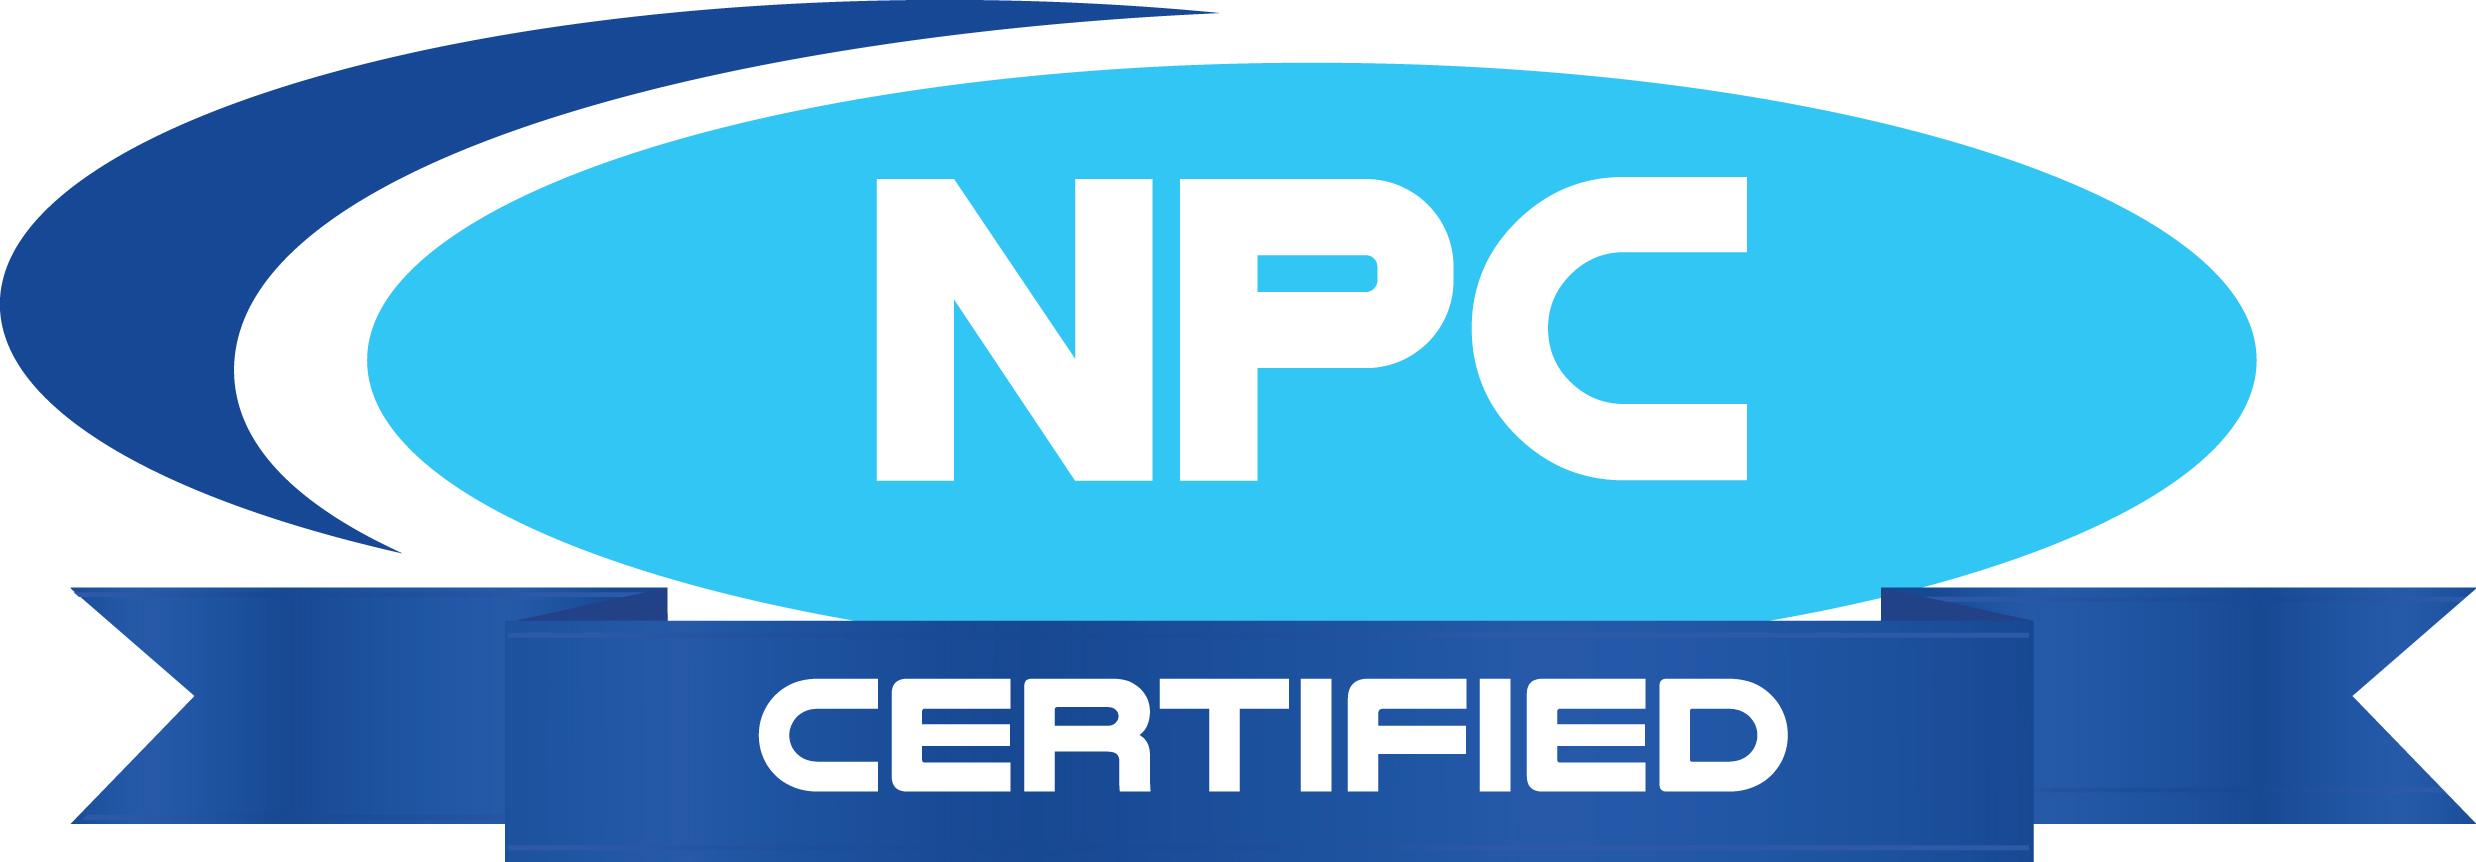 NPC Certified Logo_2015.jpg